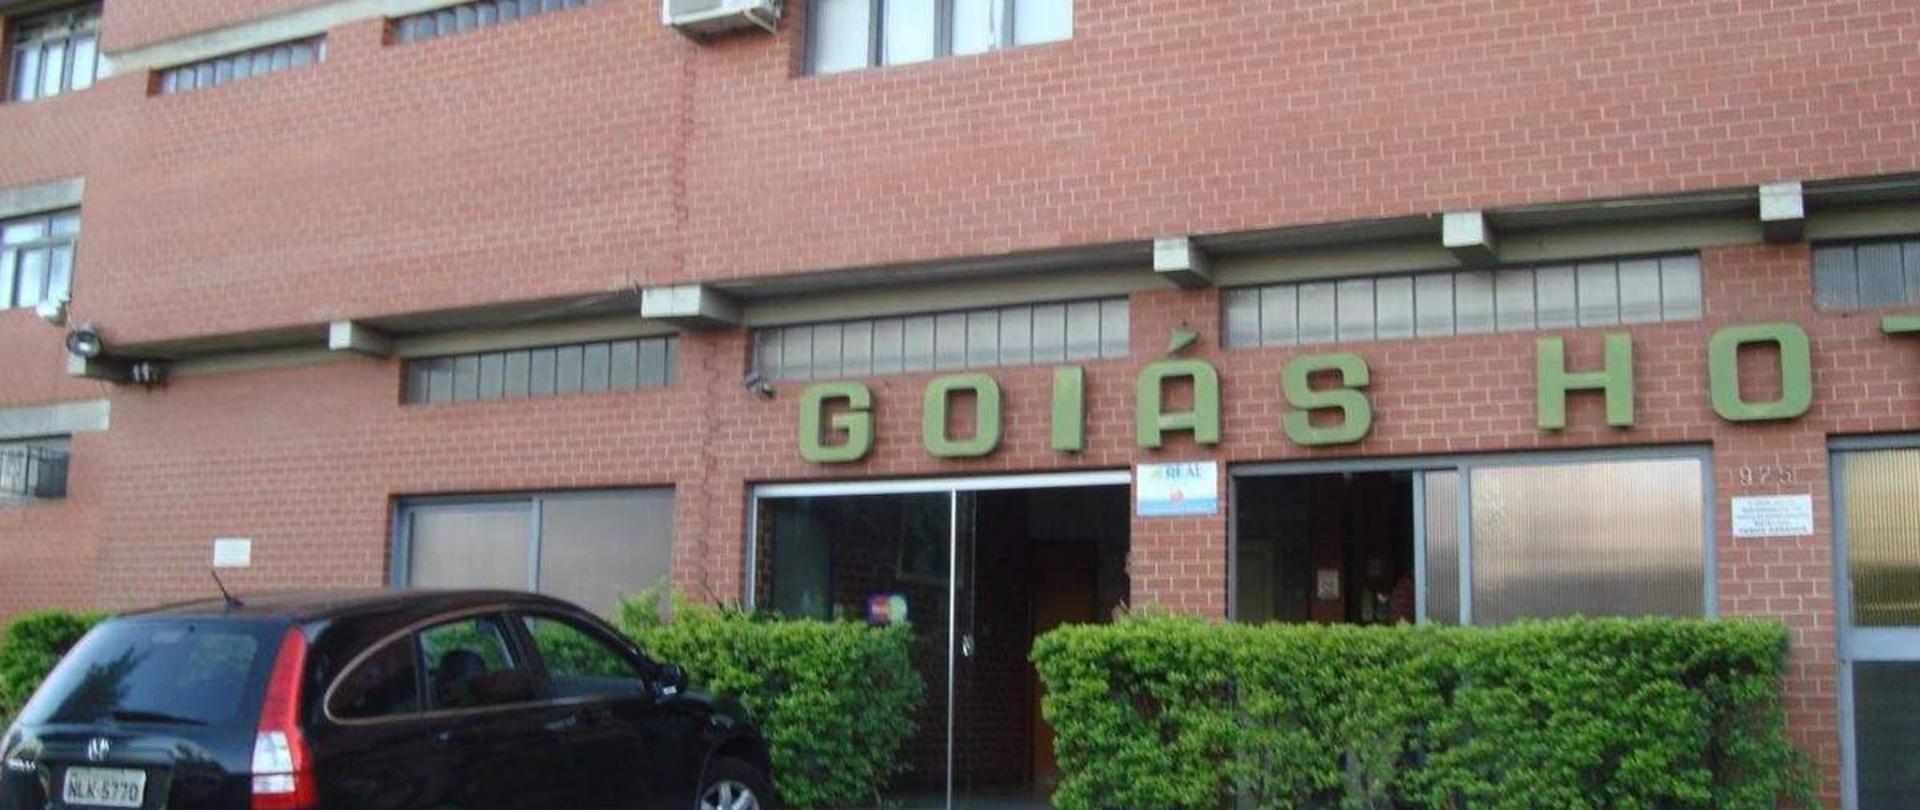 Hotel Goiás.jpg